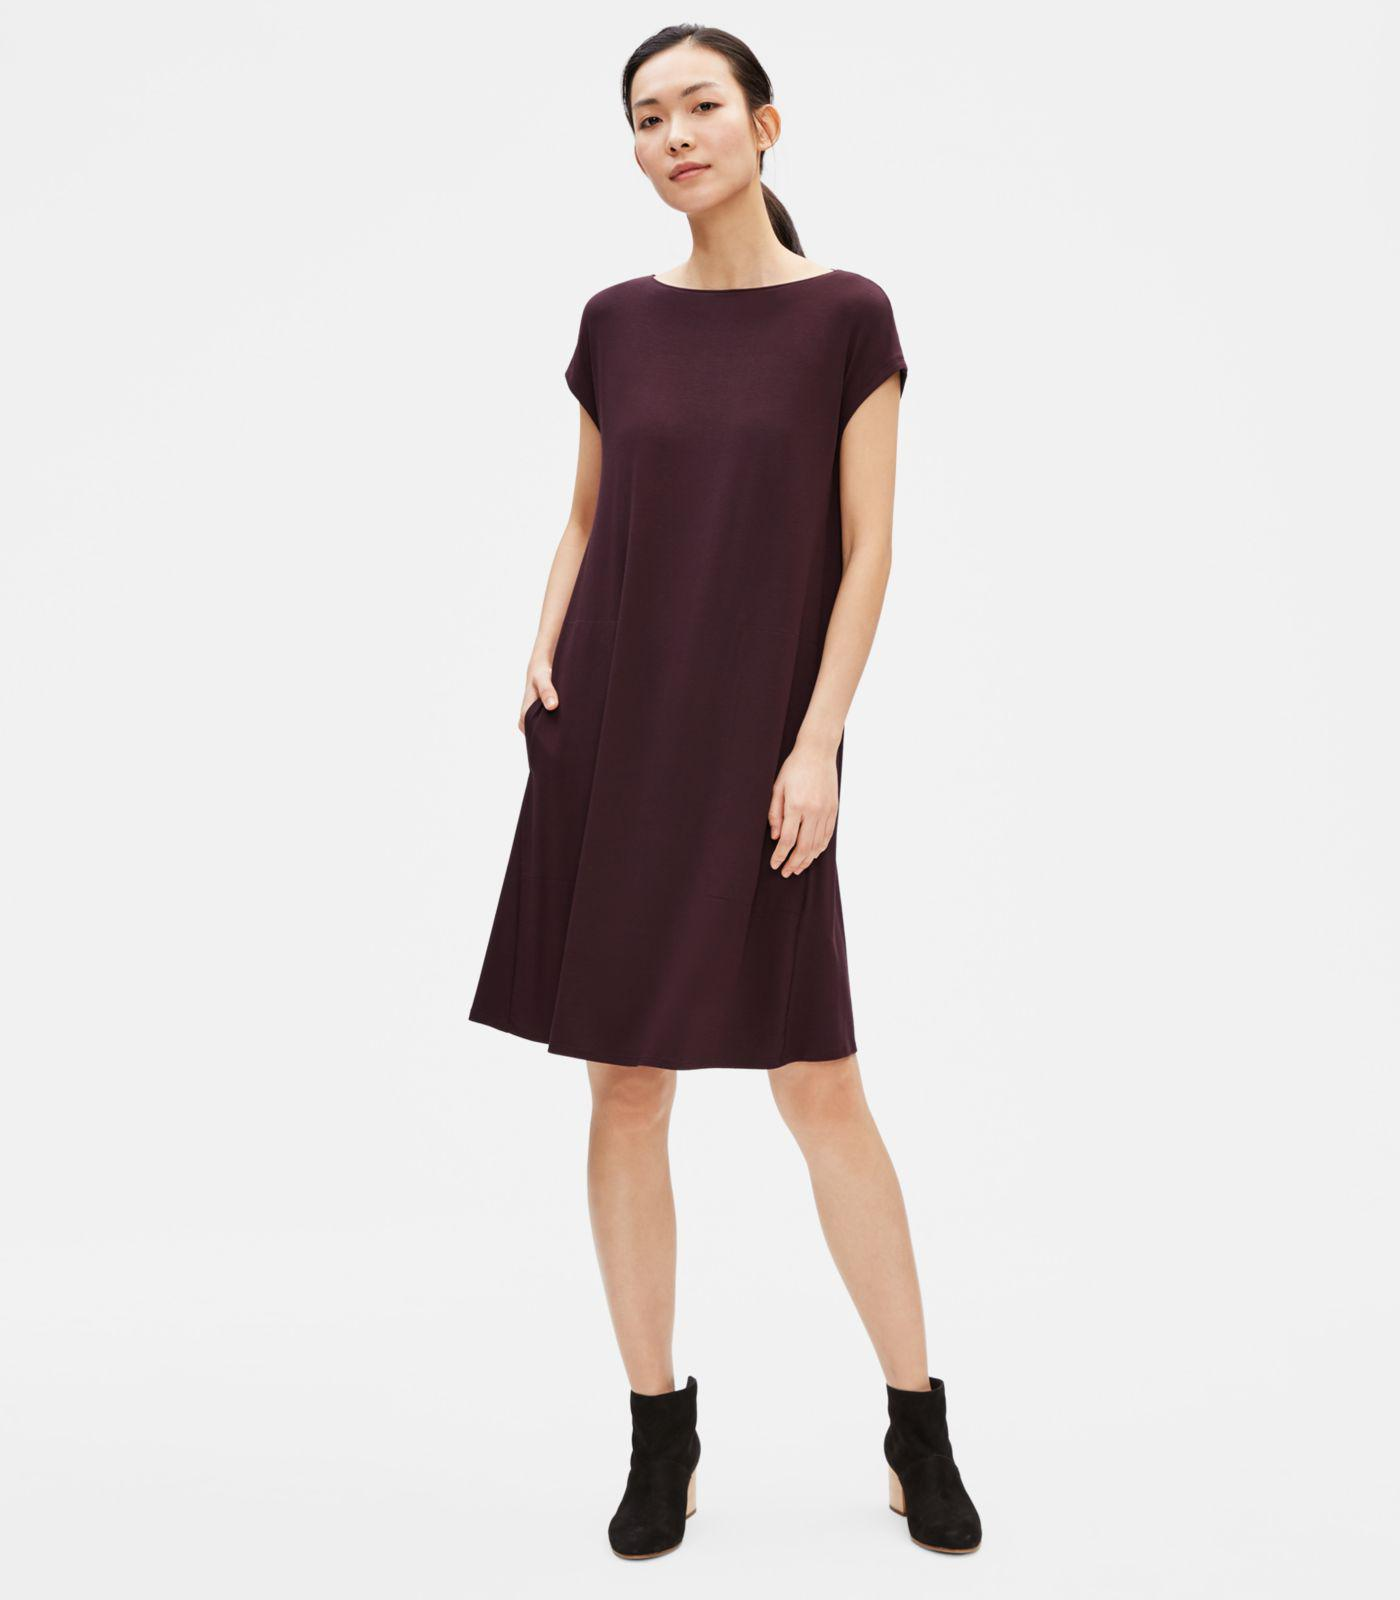 dc7239f27fd48c Lyst - Eileen Fisher Viscose Jersey Dress With Back Twist